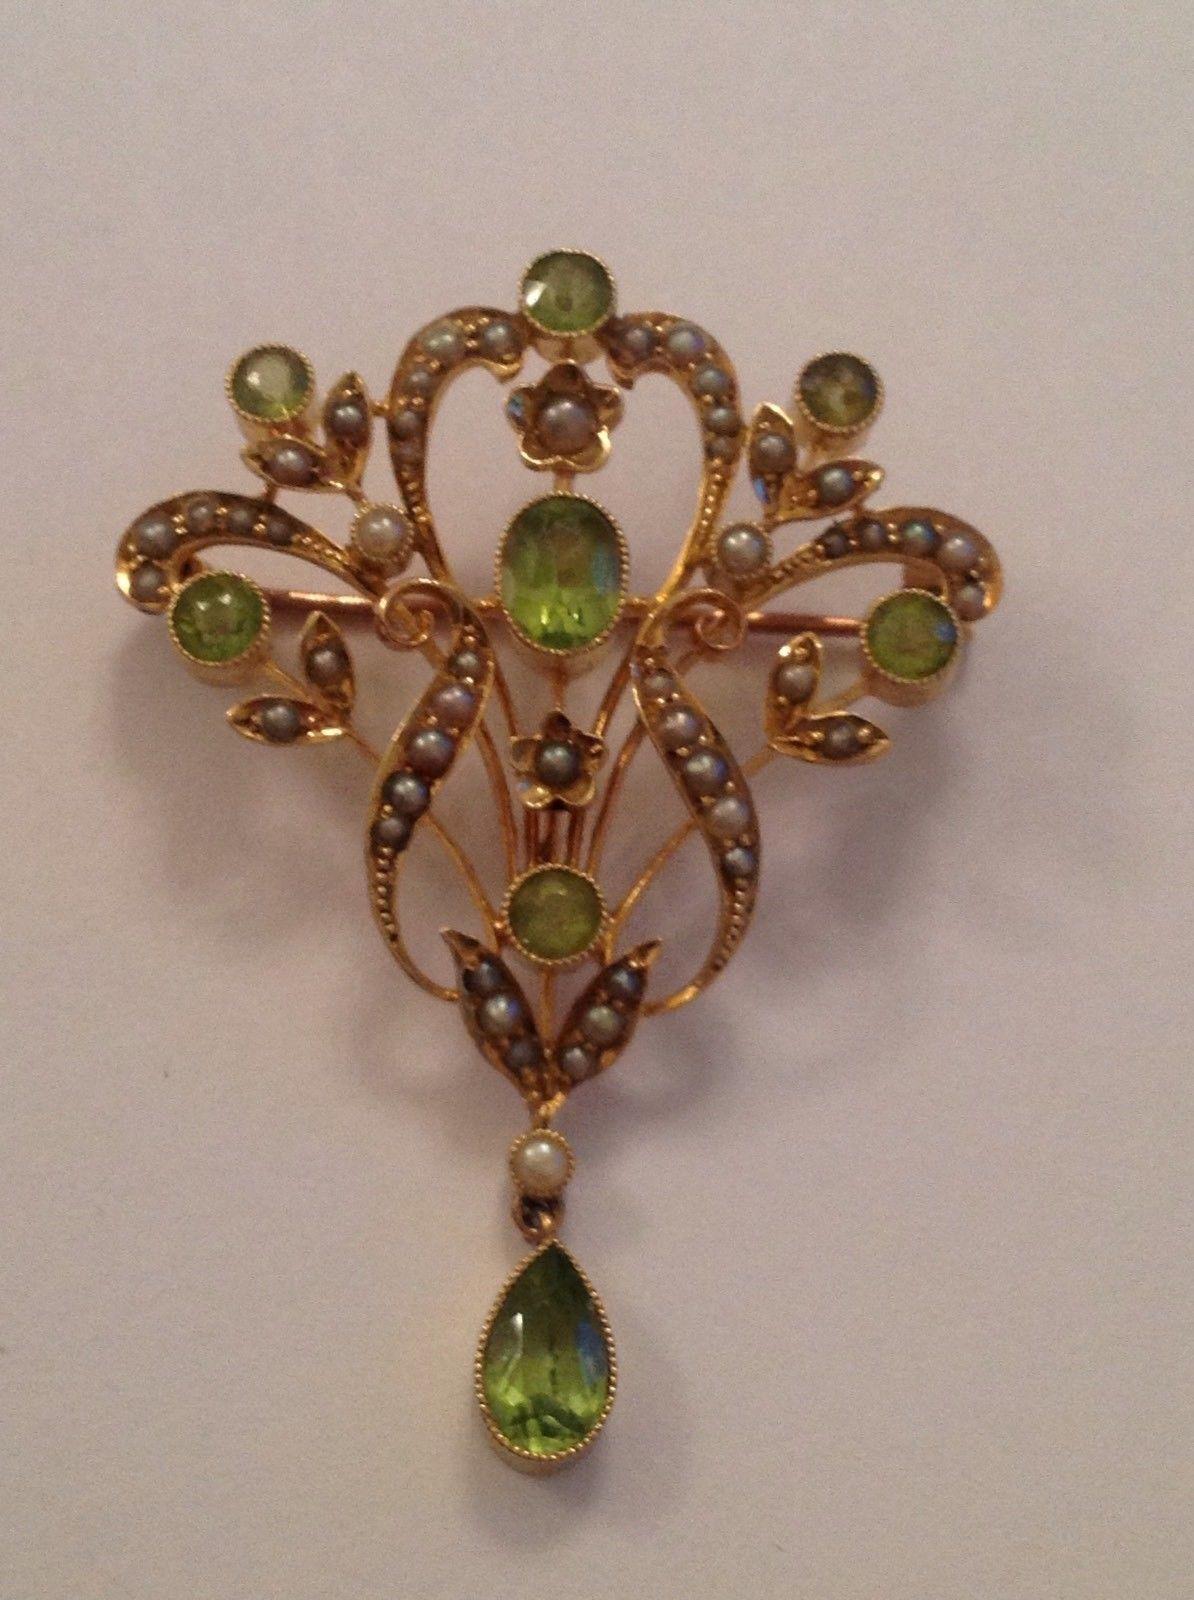 Antique Art Nouveau 15ct Gold Peridot Seed Pearl Set Pendant Brooch Ebay 브로치 쥬얼리